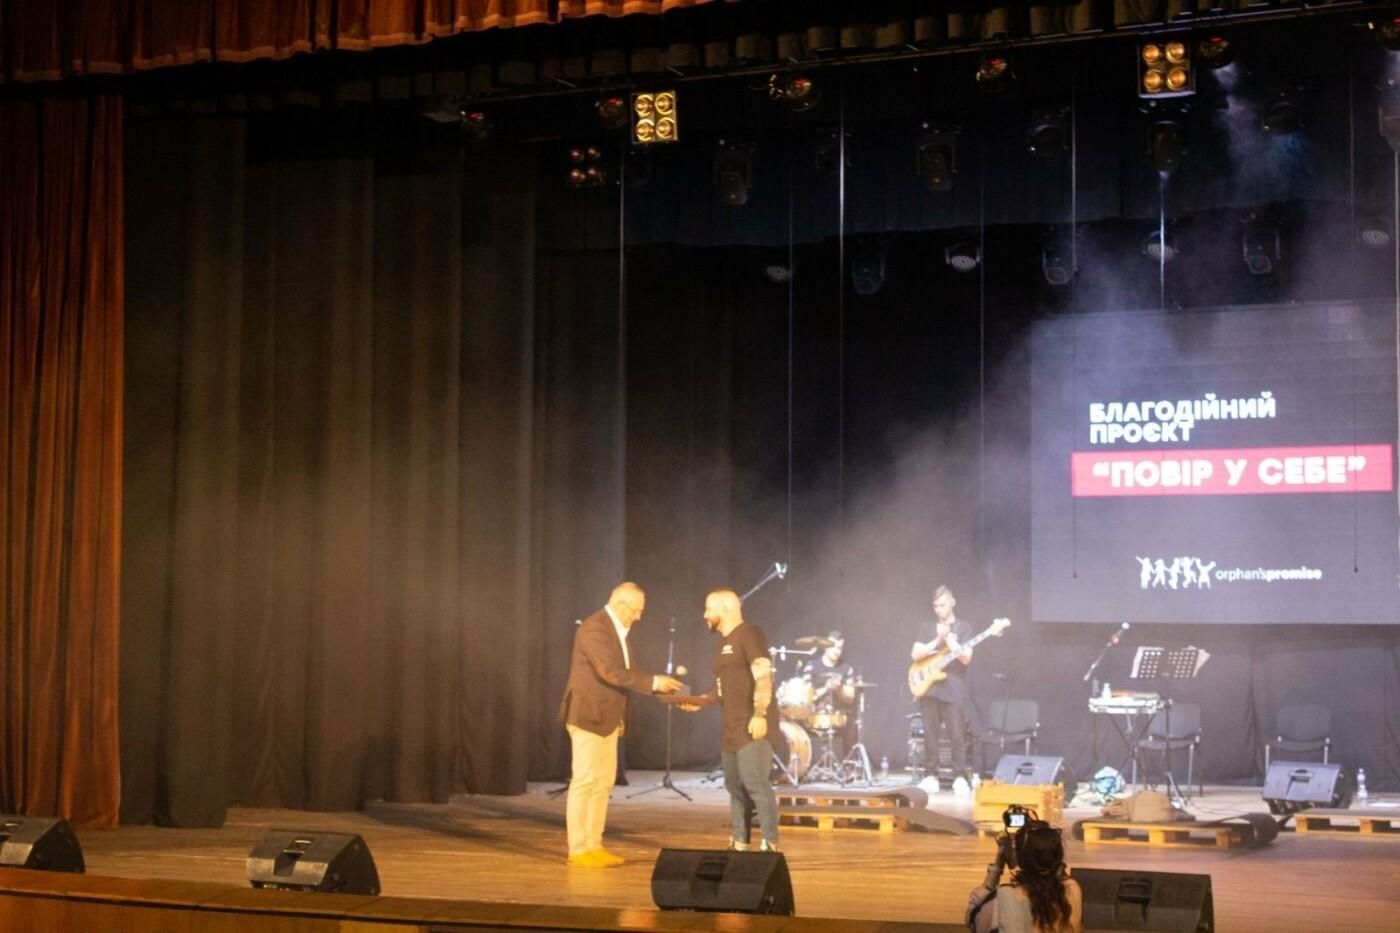 «Поверь в себя»: в Бердянске посвятили концерт проблемам молодежи, фото-3